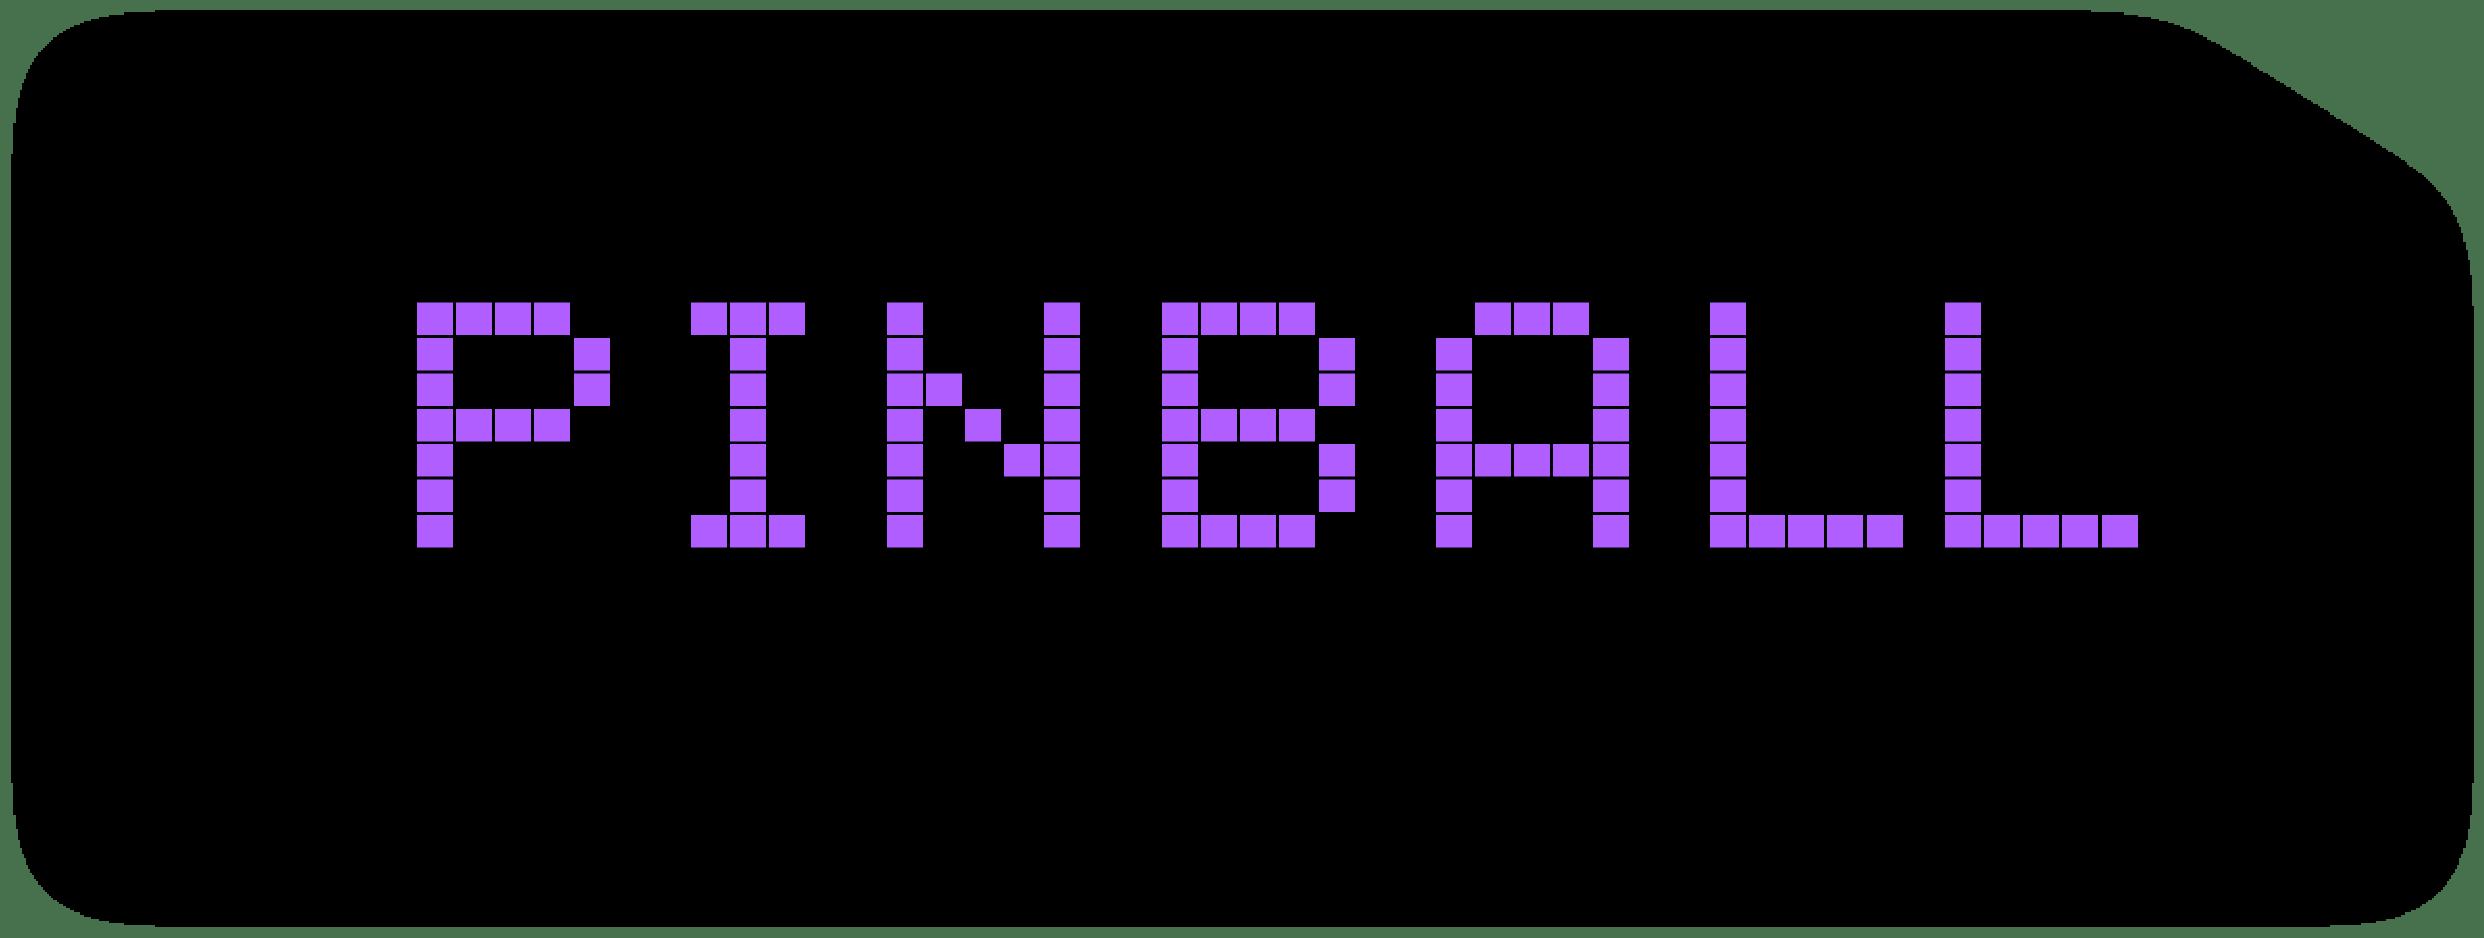 Pinball Button